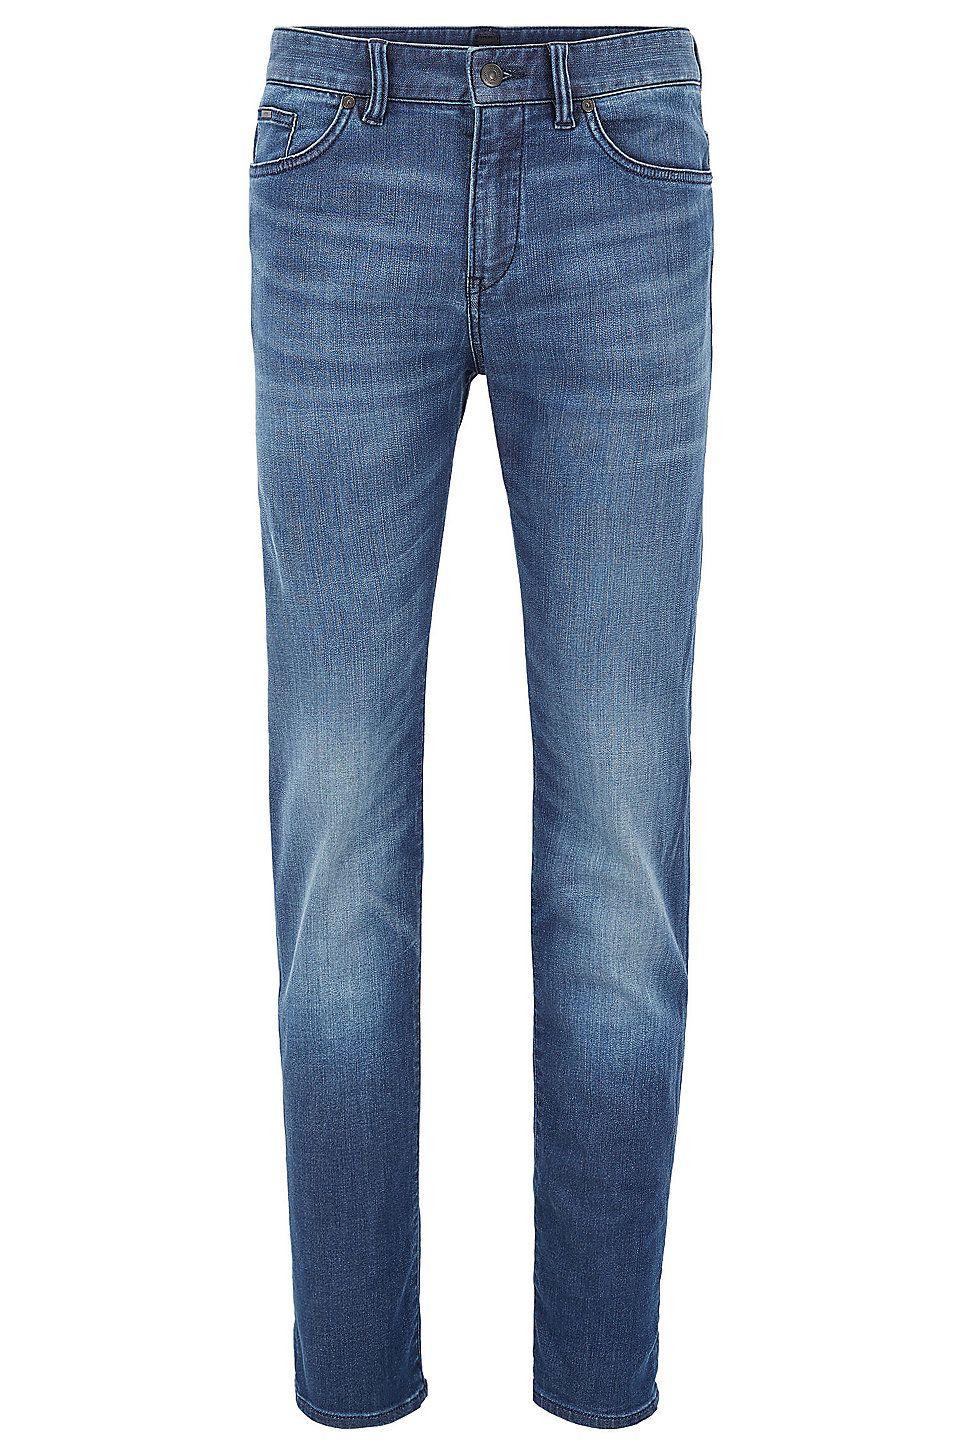 Hugo boss midblue slimfit jeans in stretch denim blue